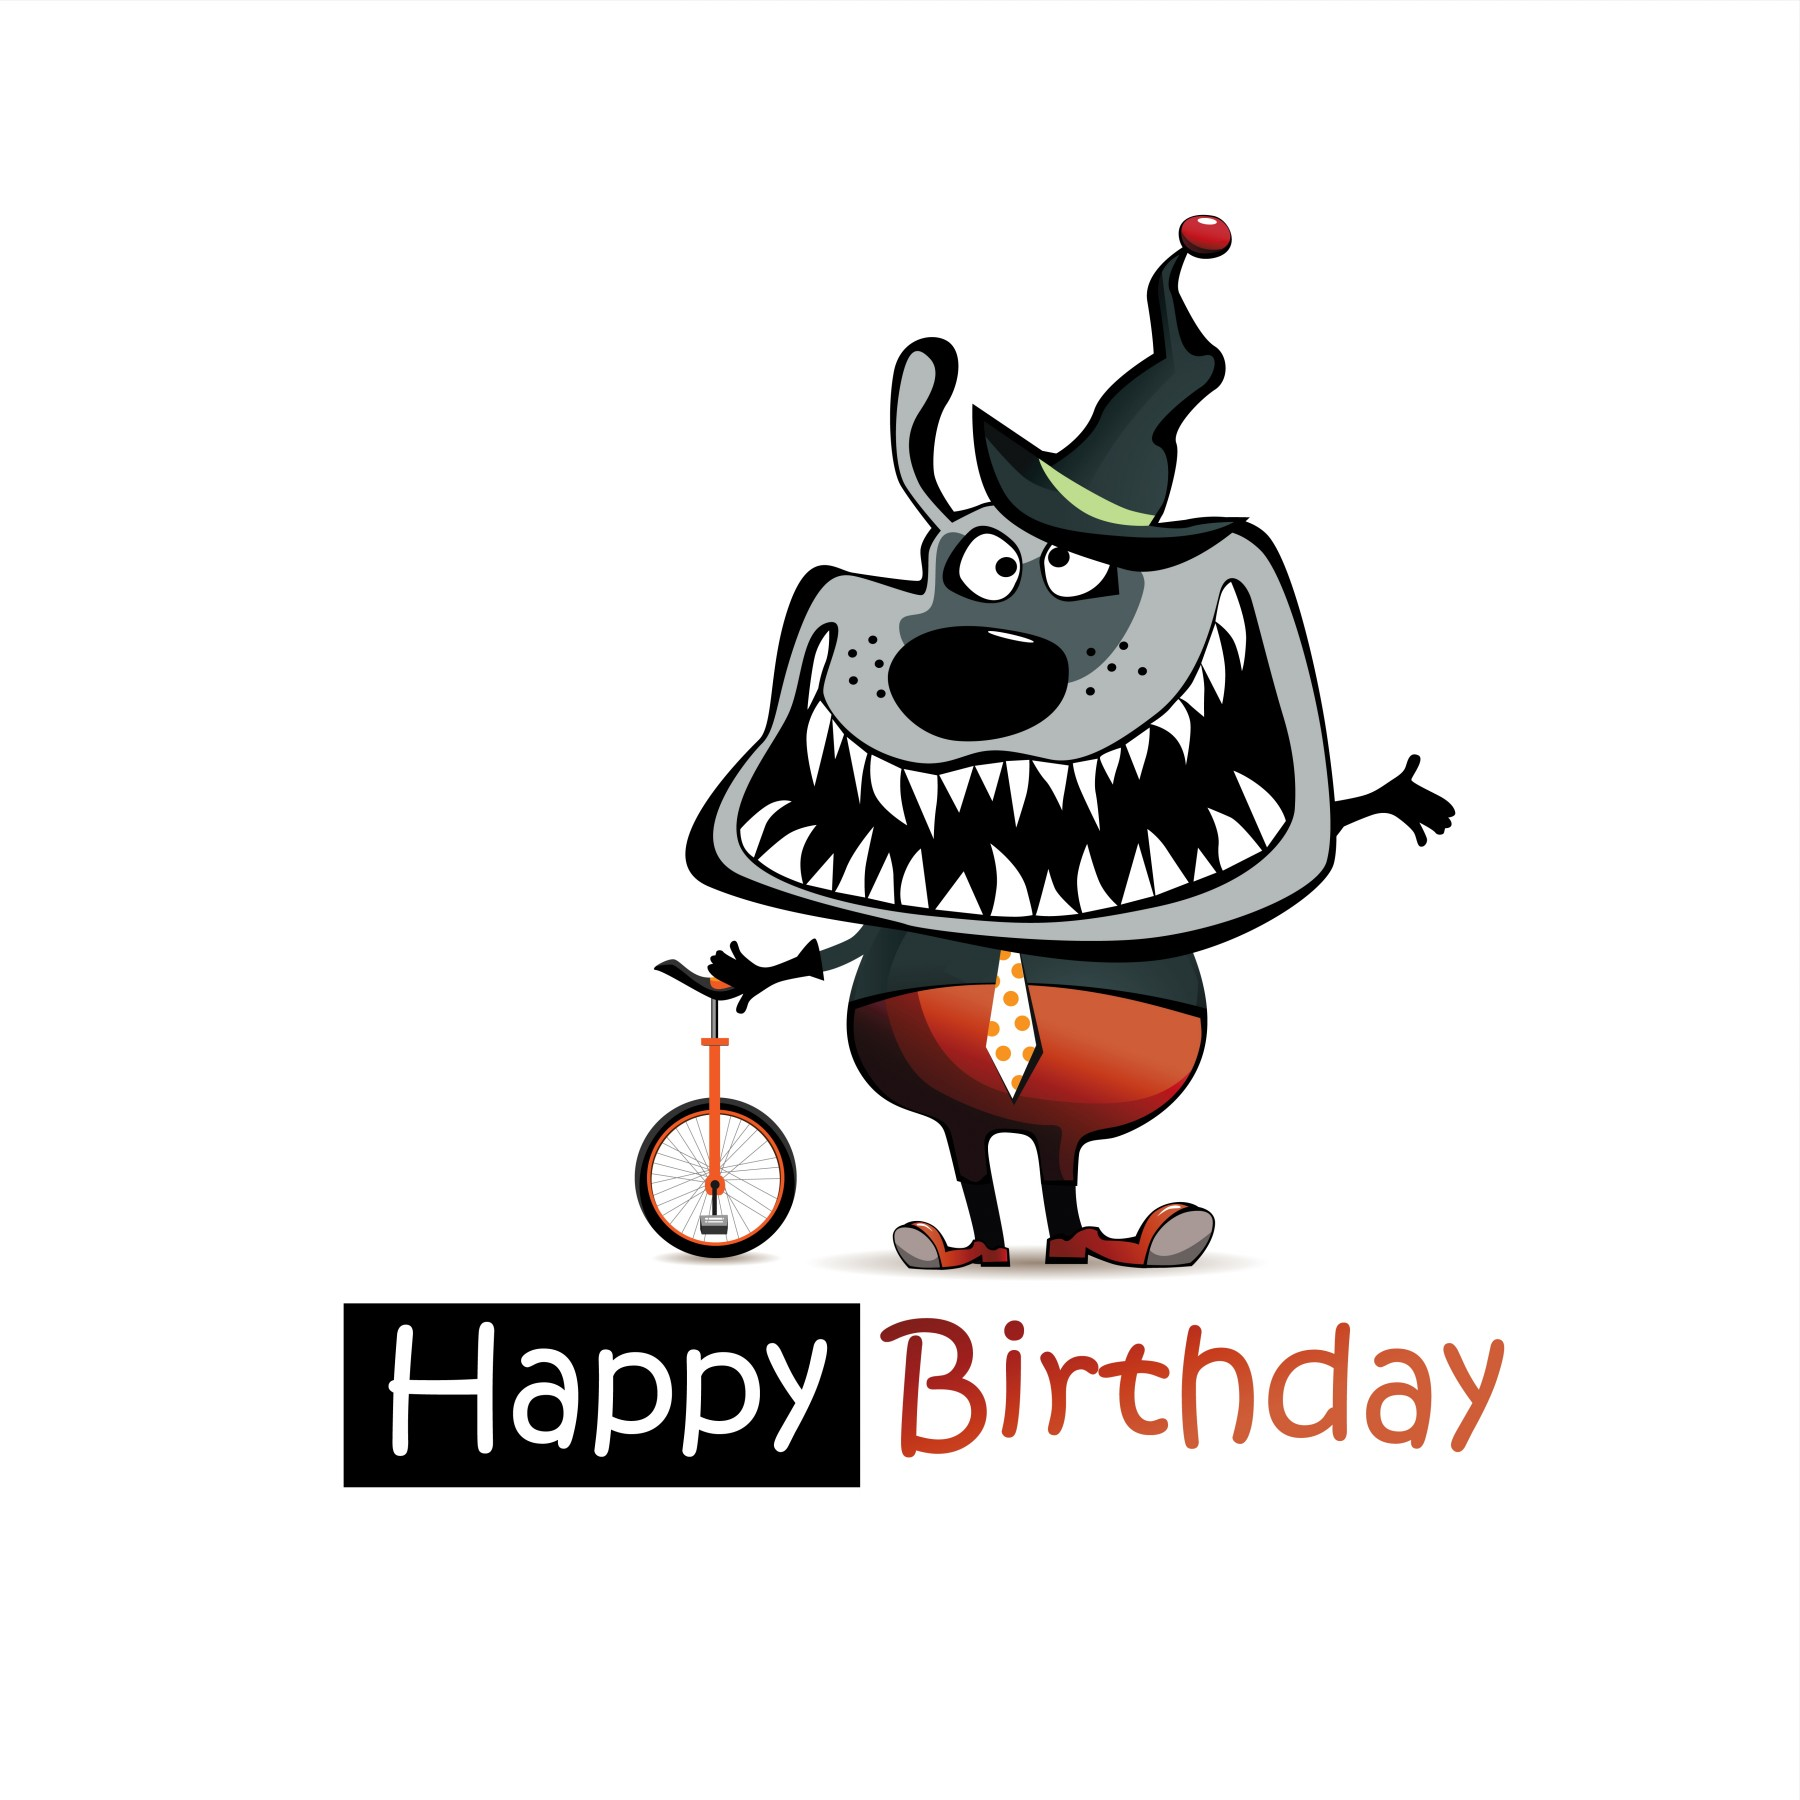 25 Happy Birthday Creative Funny Greeting Cards Elsoar – Free Animated Birthday Invitations